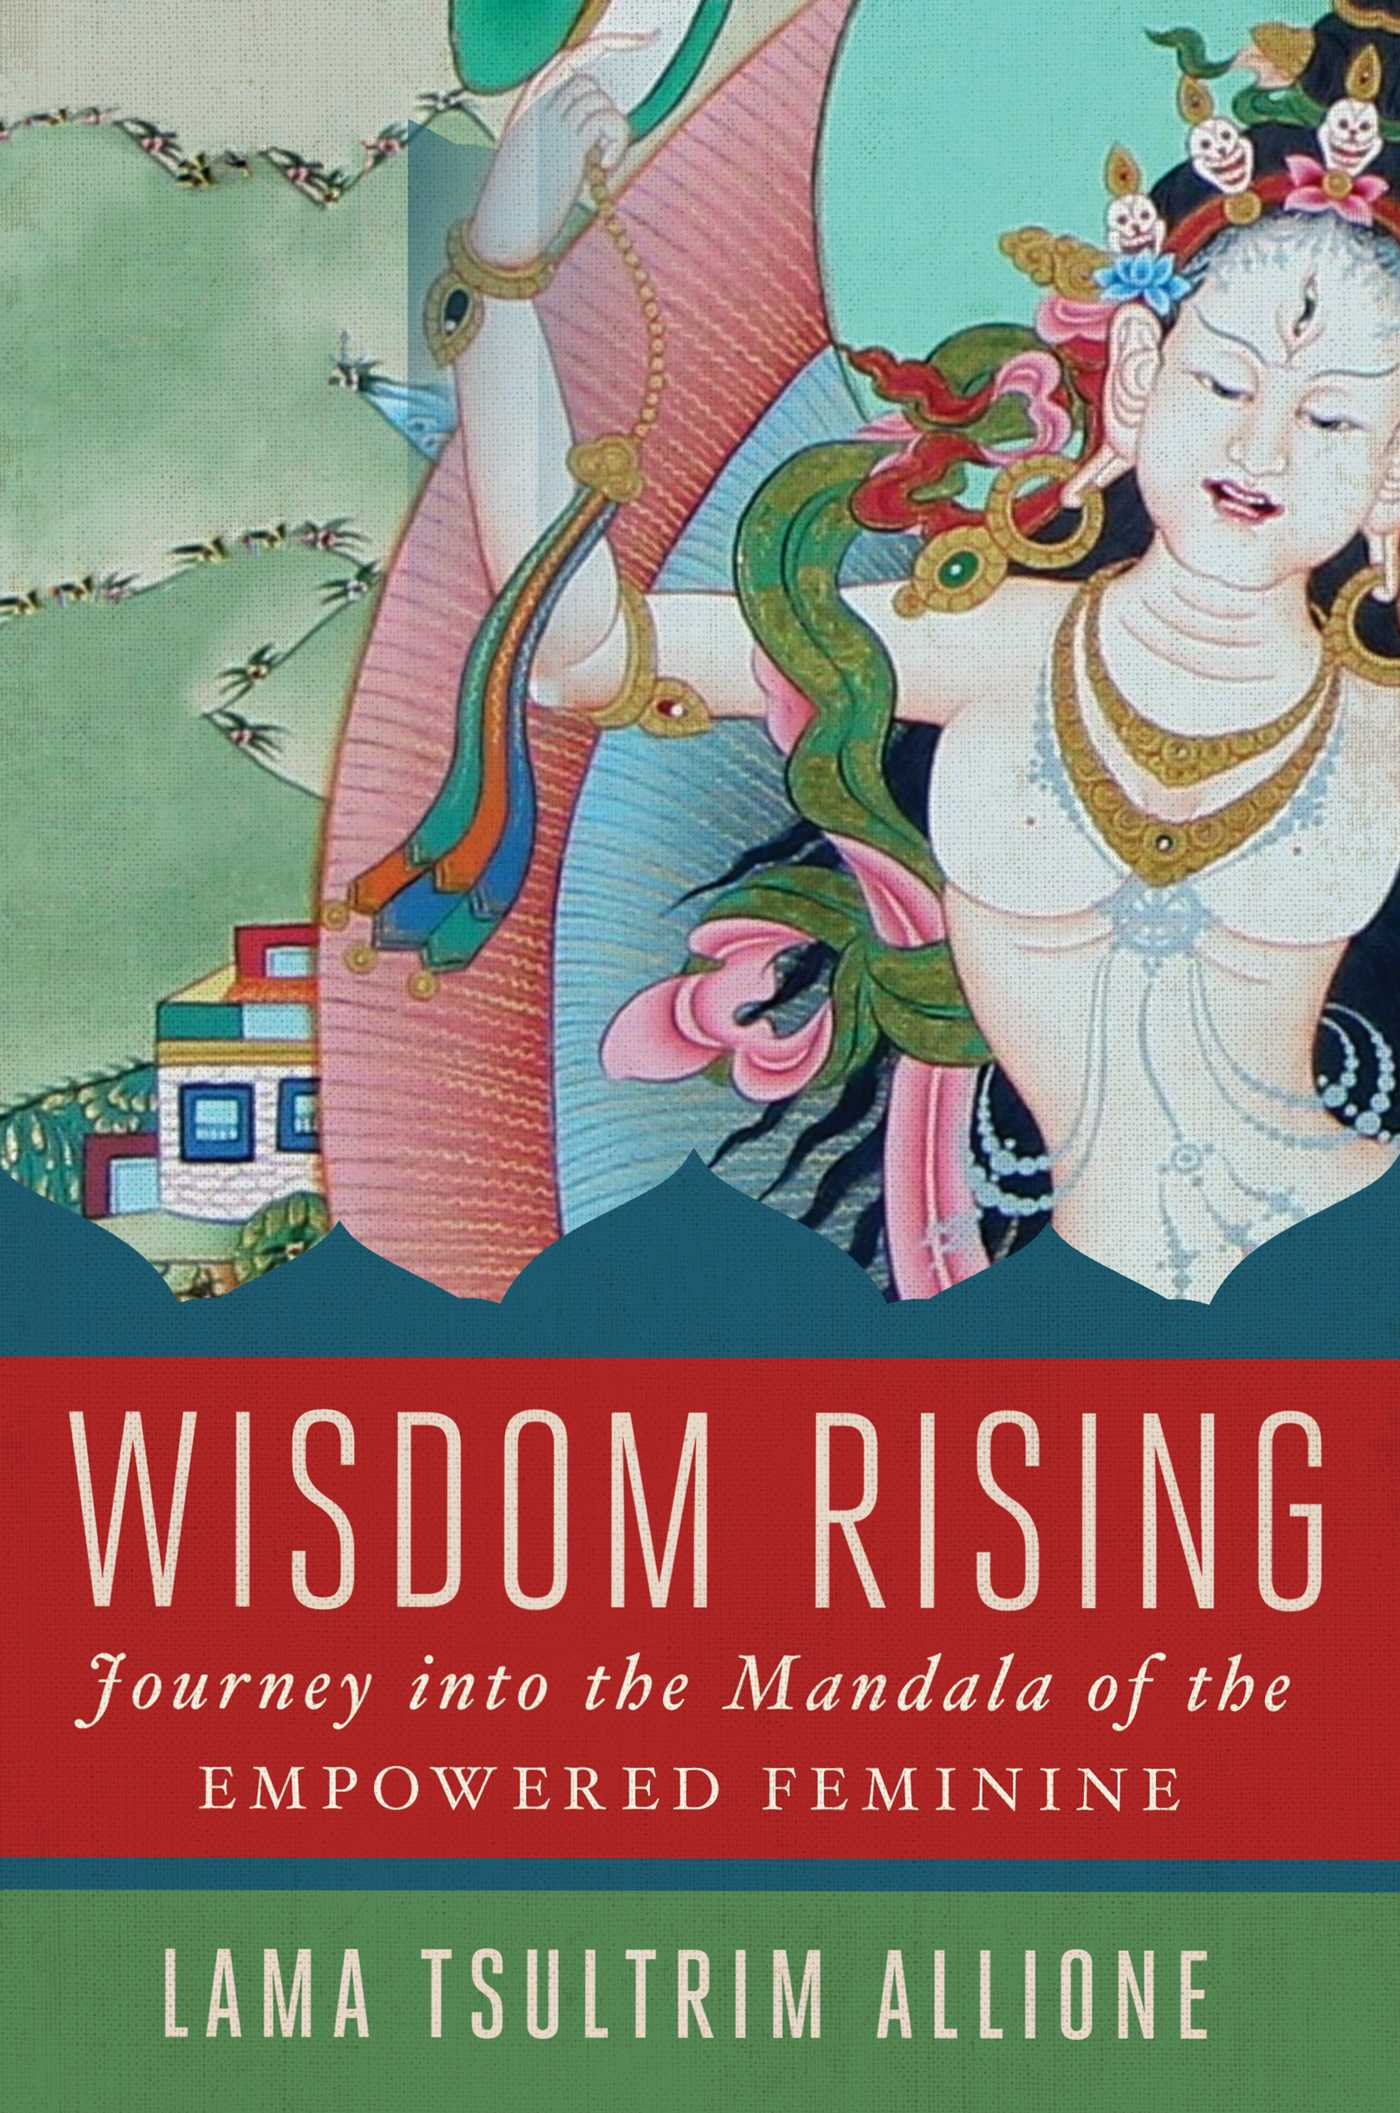 Wisdom rising 9781501115035 hr